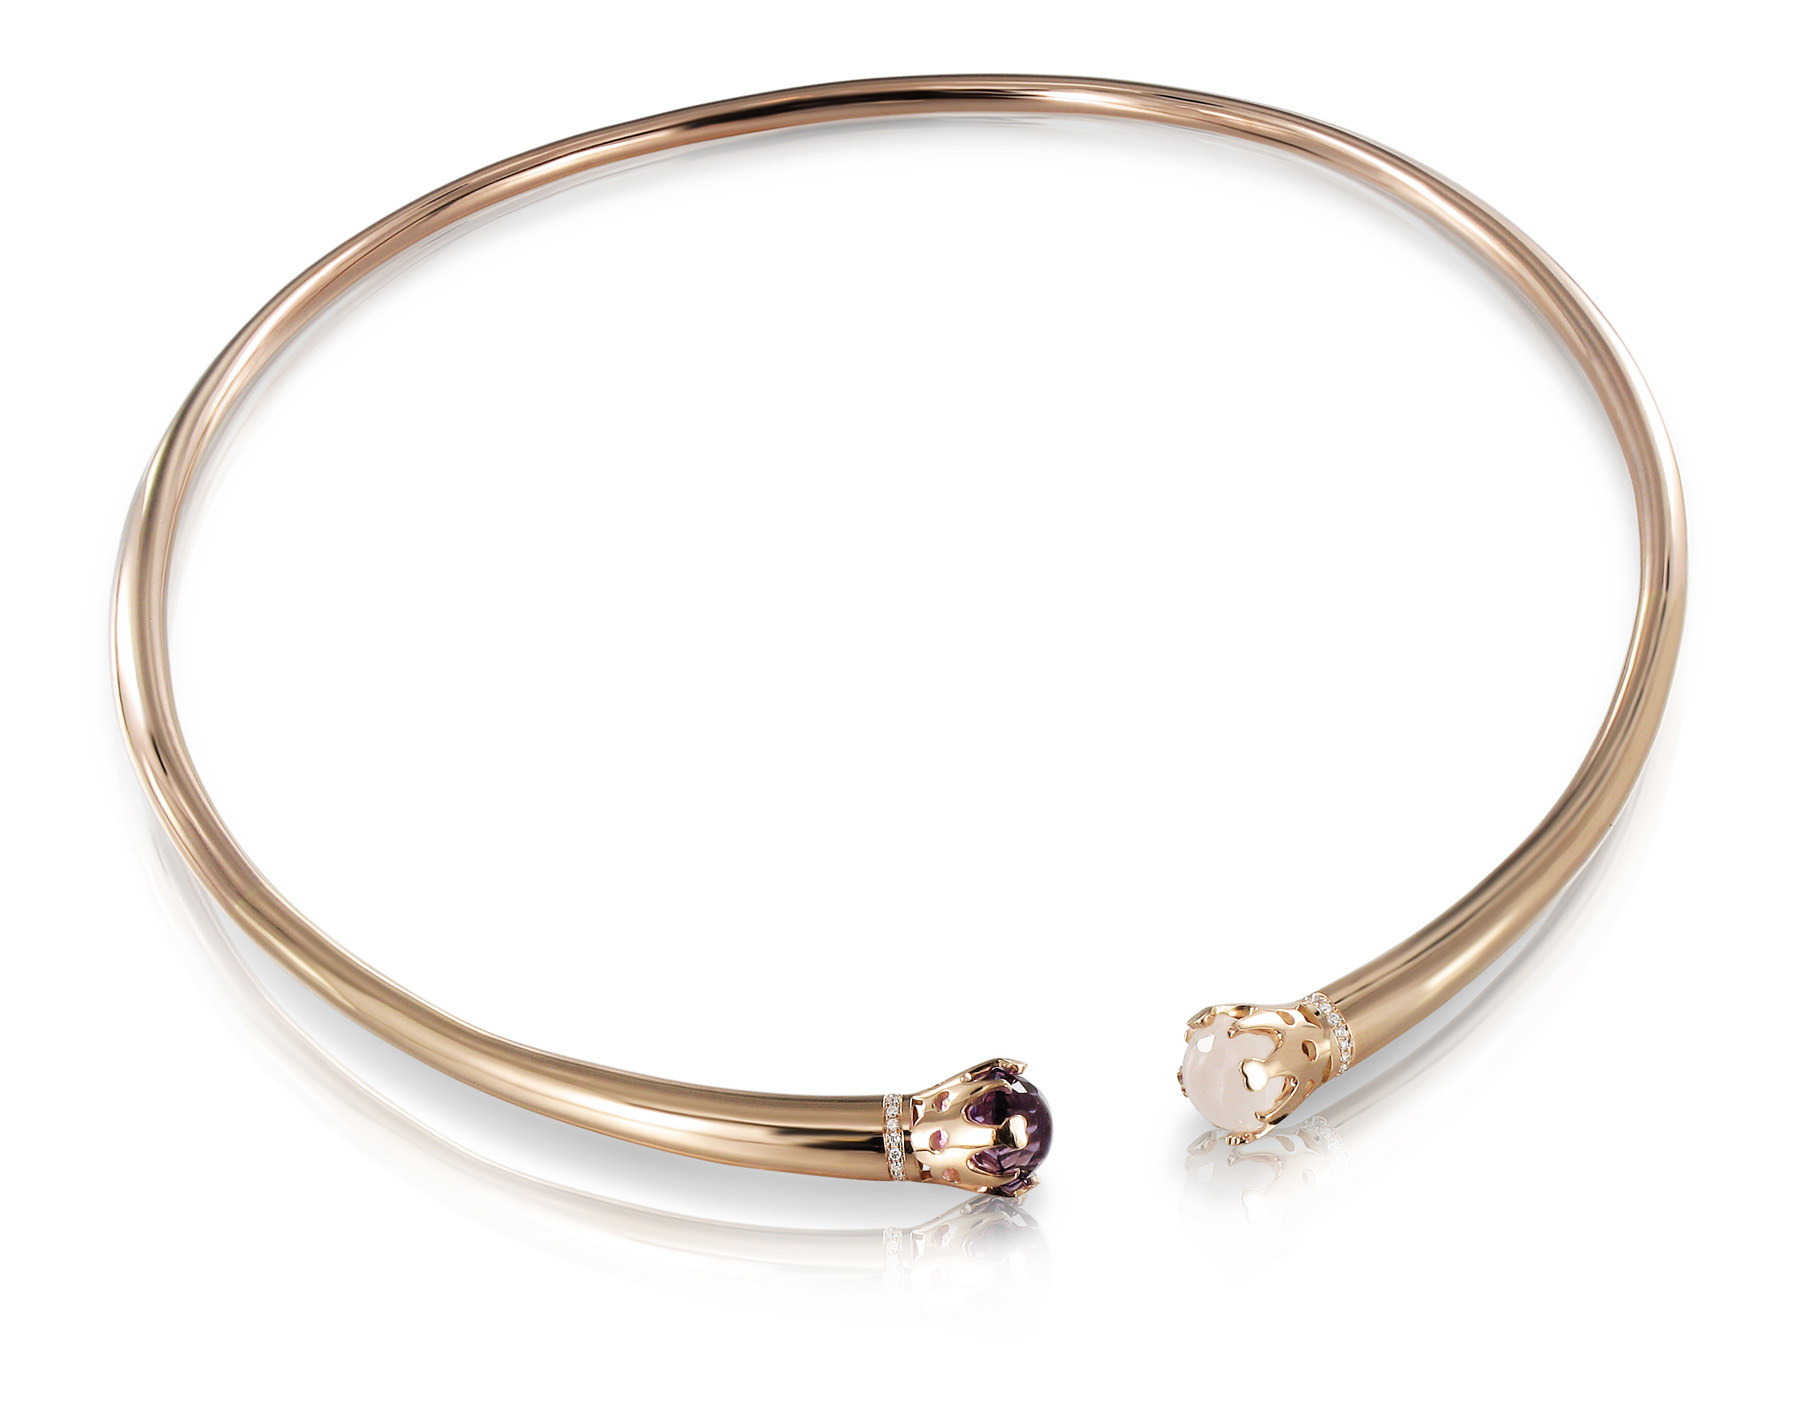 Sissi Io Amo_necklace_14621R.jpg